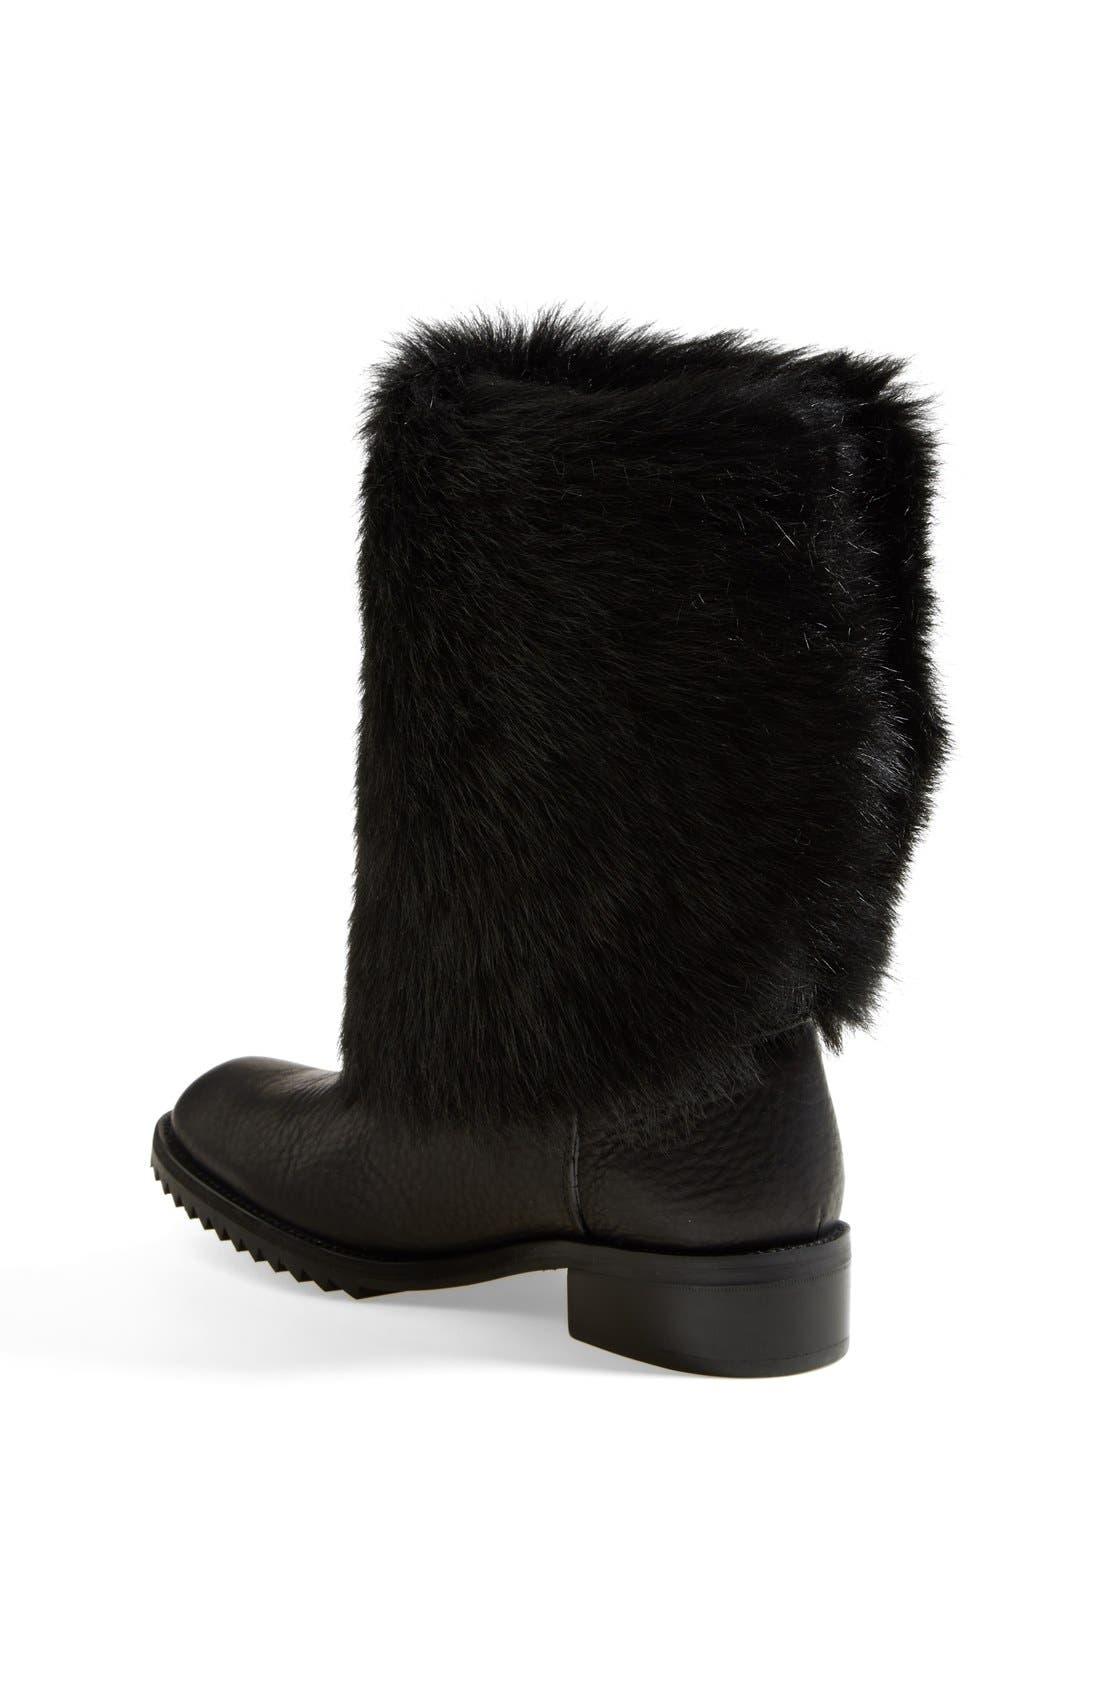 Alternate Image 2  - Pedro Garcia 'Odette' Genuine Shearling & Leather Boot (Women)